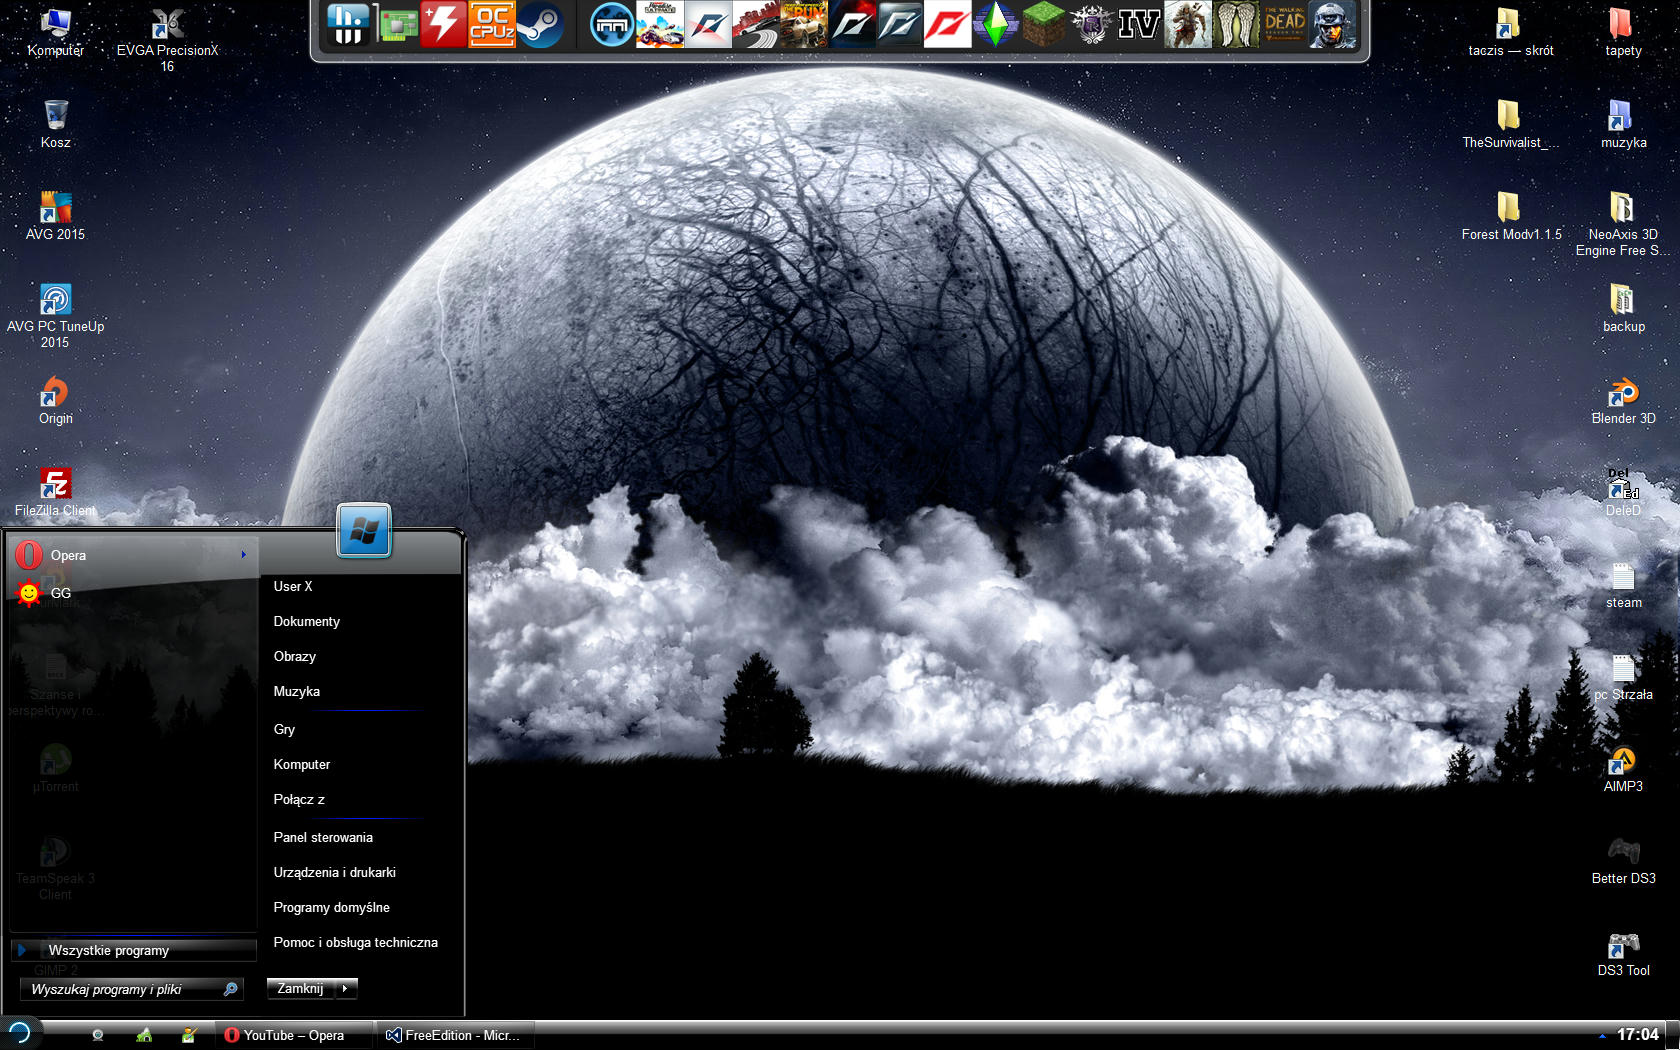 Unreal Software - Thread: Your desktop image